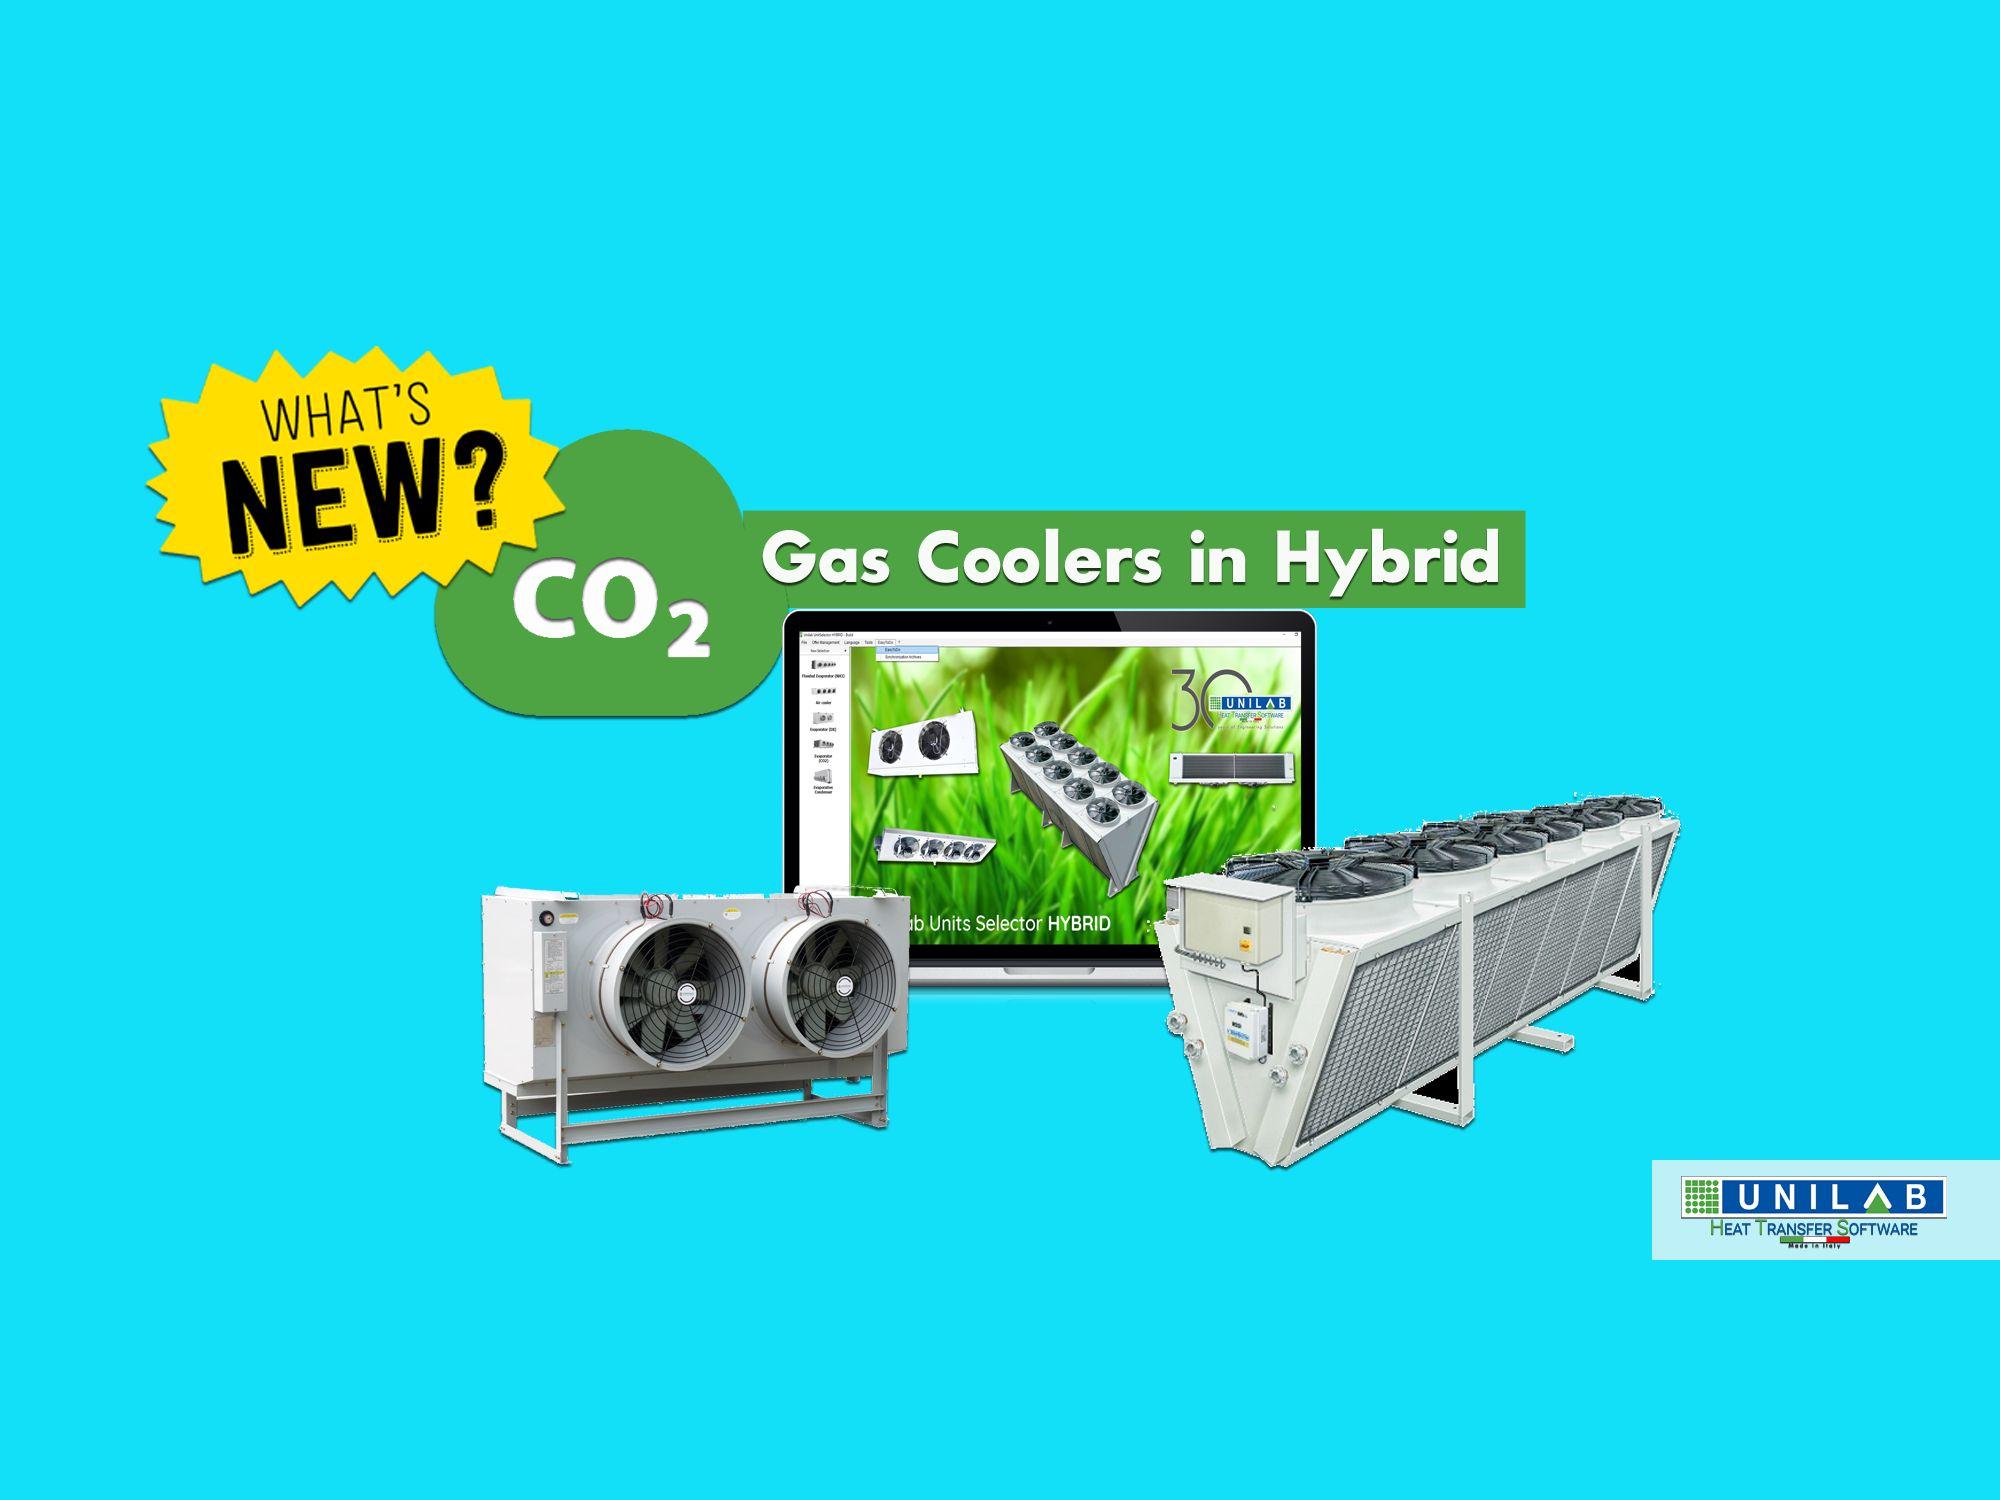 unilab blog software scambio termico gas cooler unit selector hybrid co2